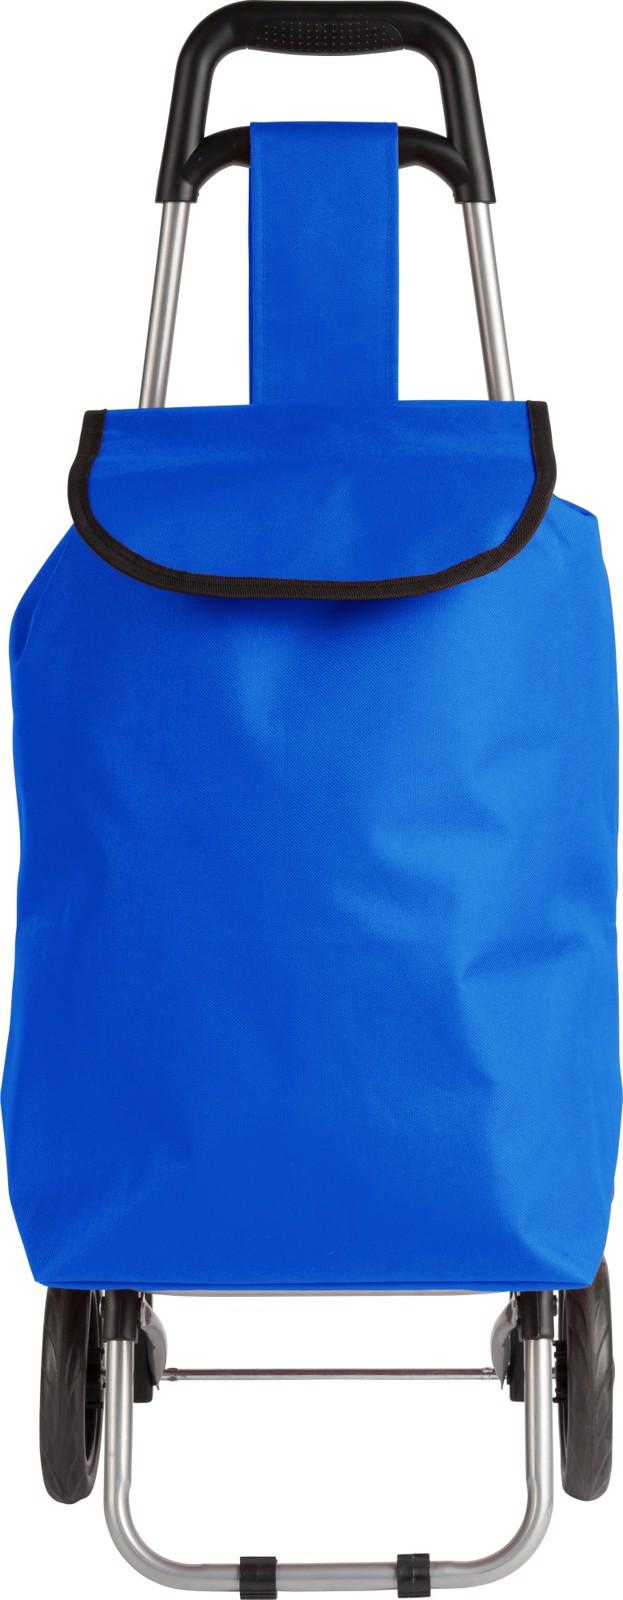 Polyester (600D) shopping trolley - Cobalt Blue